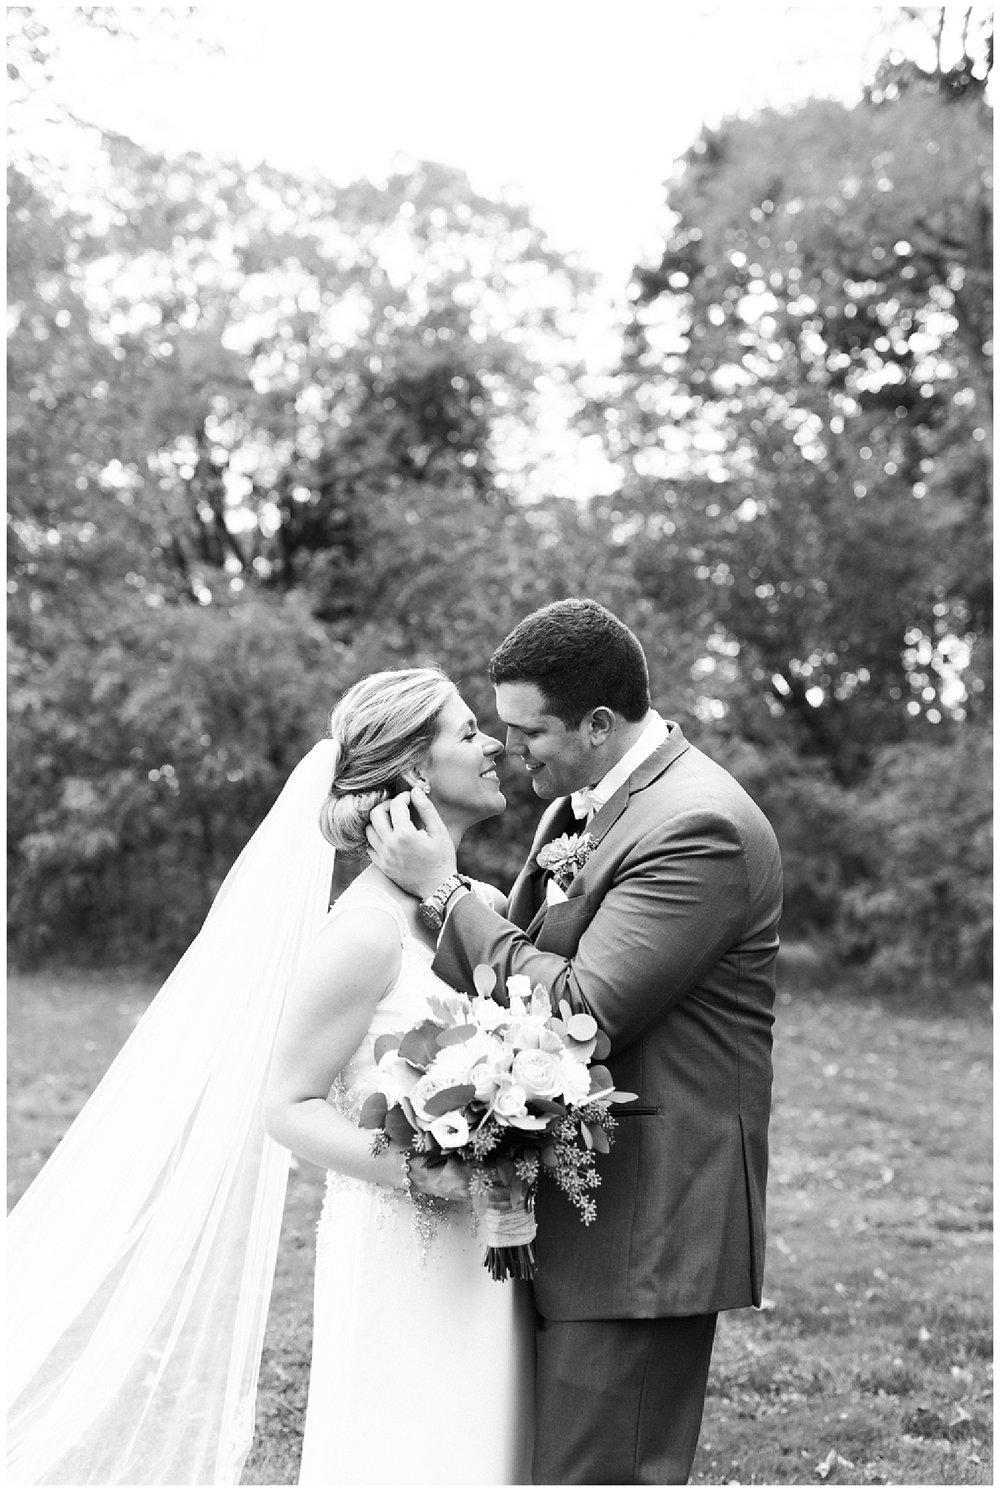 New Jersey Wedding   Basking Ridge Country Club, Basking Ridge, NJ   www.redoakweddings.com